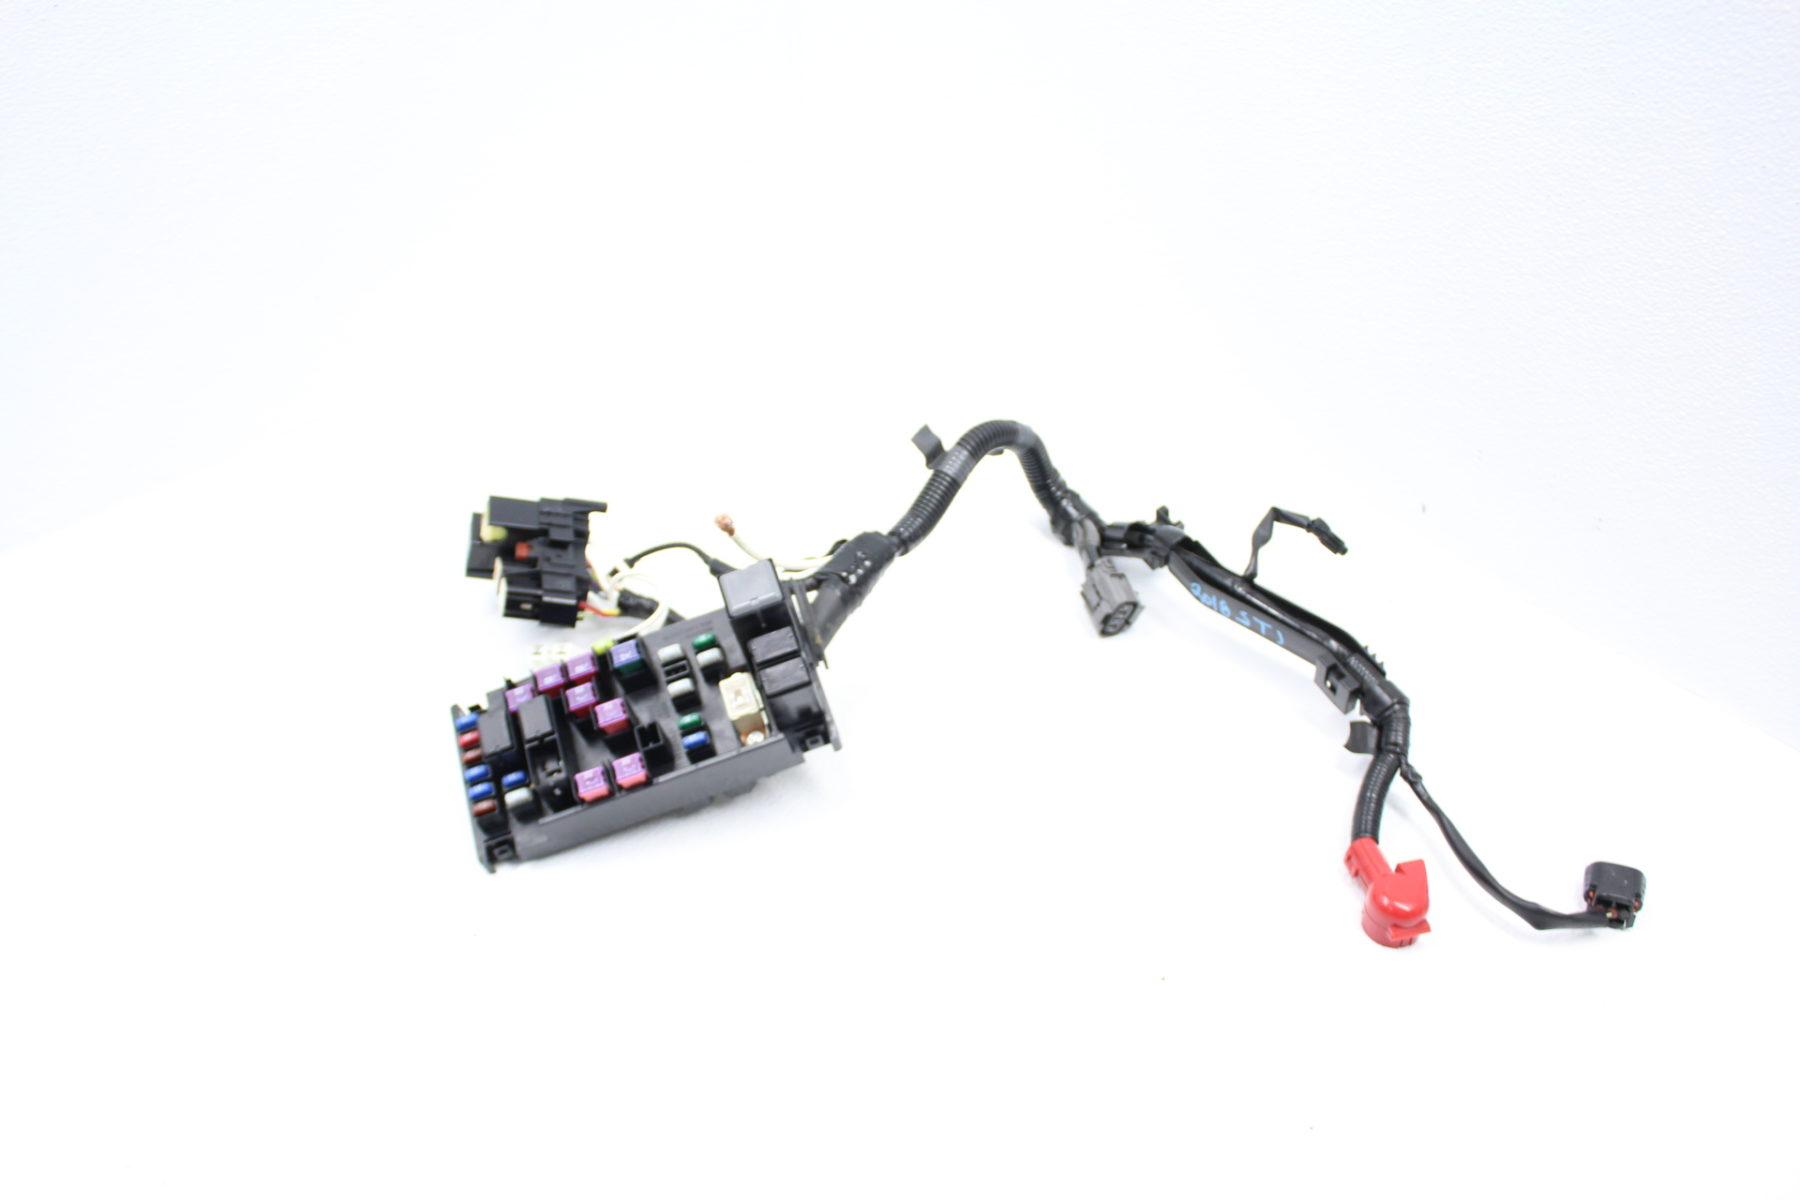 hight resolution of 2017 2018 subaru impreza wrx sti fuse box relay panel wire wiring harness